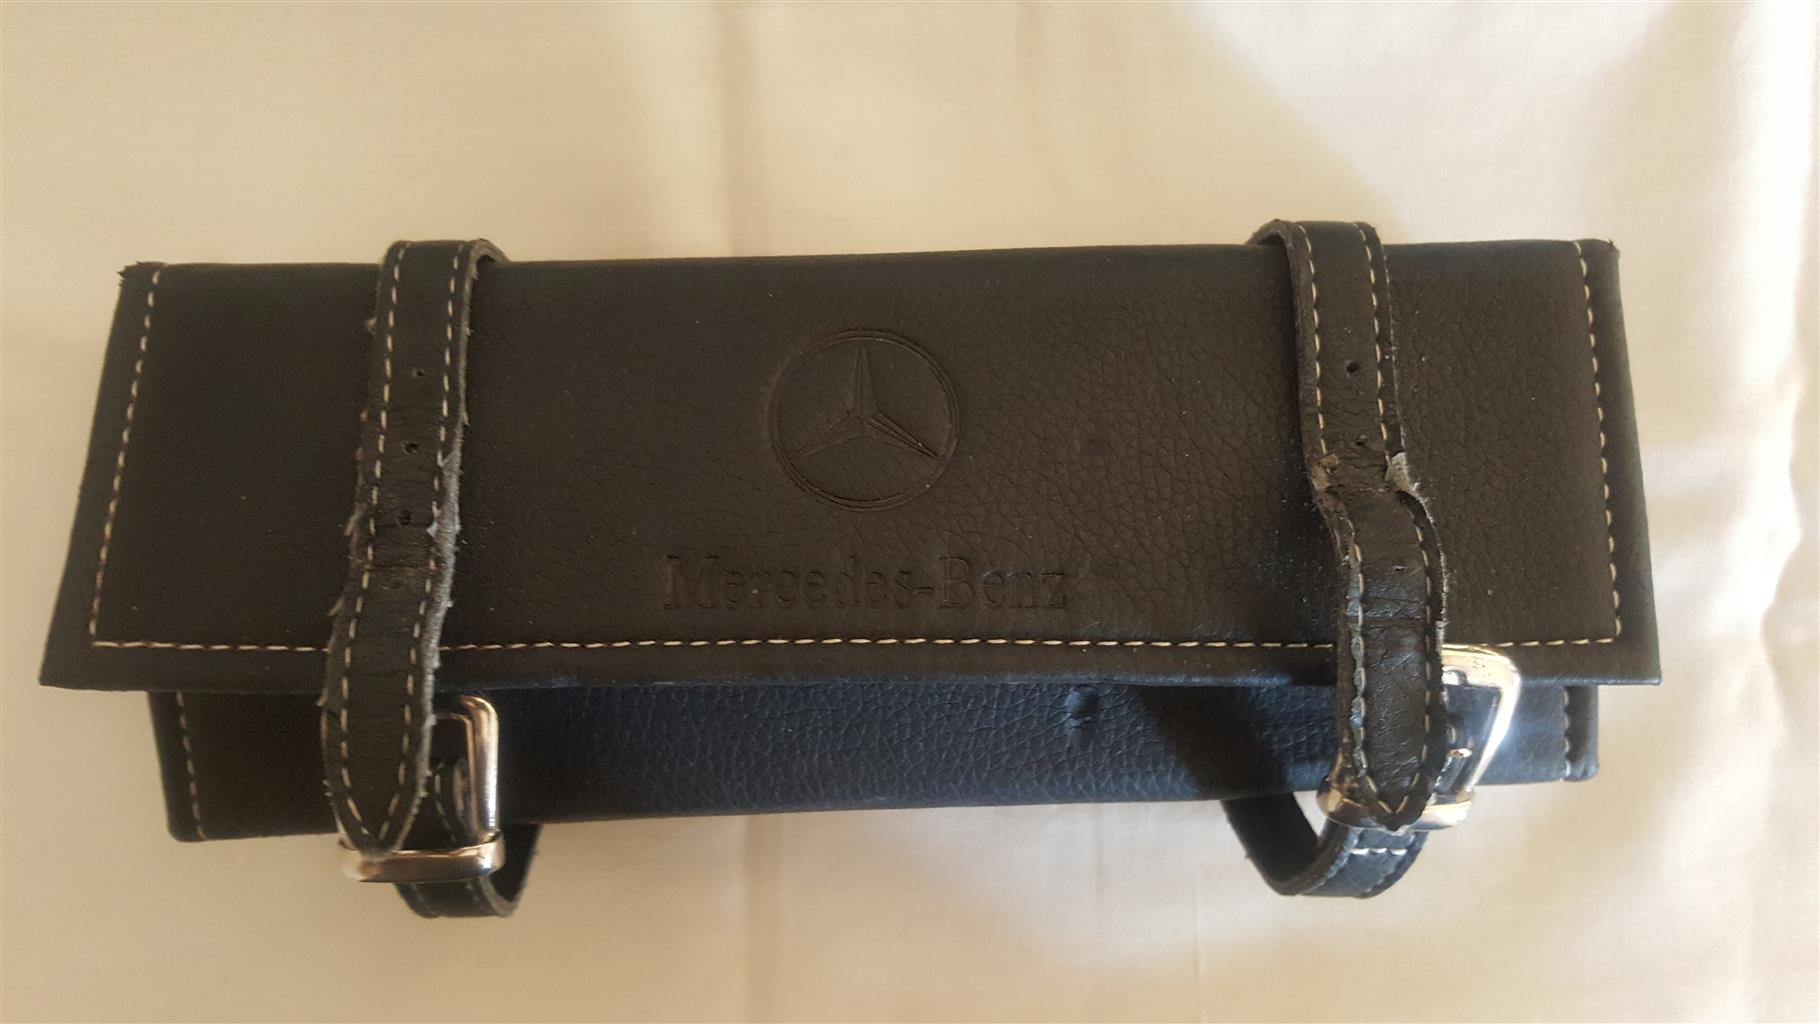 Original Mercedes Benz watch in casing with certificate